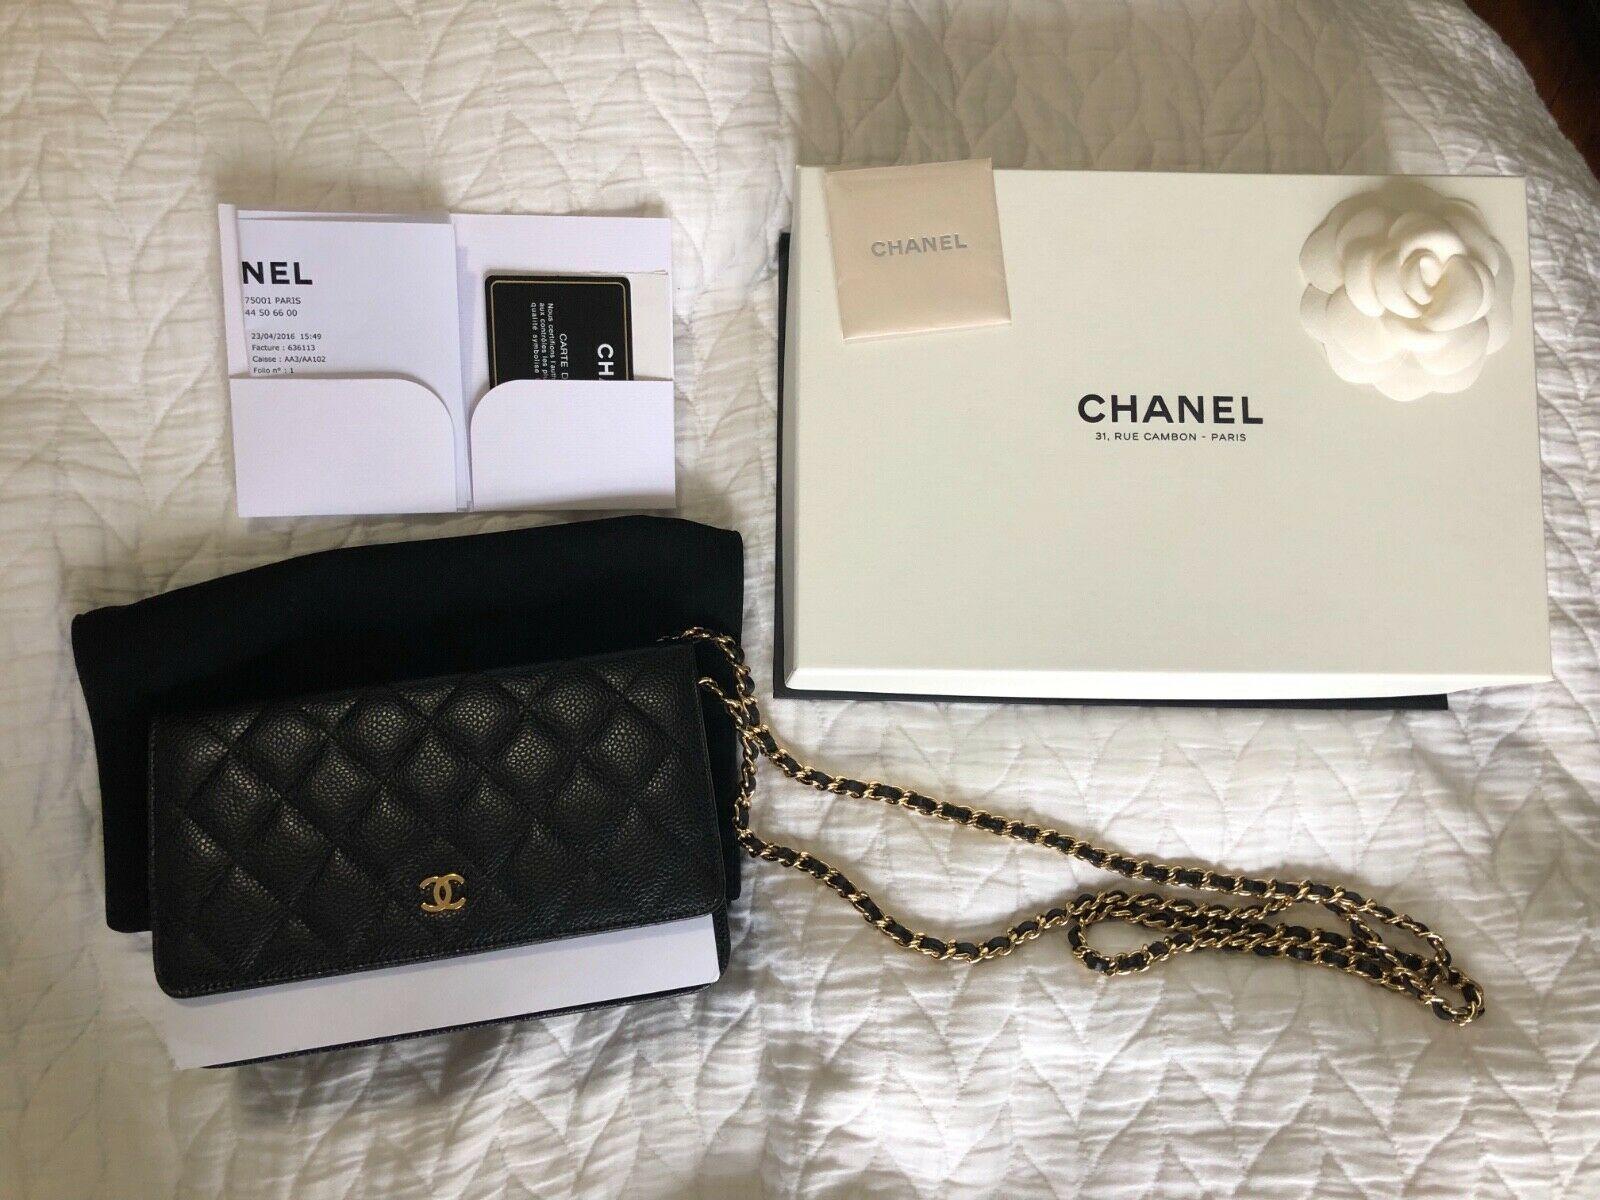 4c94cbfa62e3 Authentic Chanel Wallet on Chain Black Caviar Gold Hardware in Excellent  Cond.